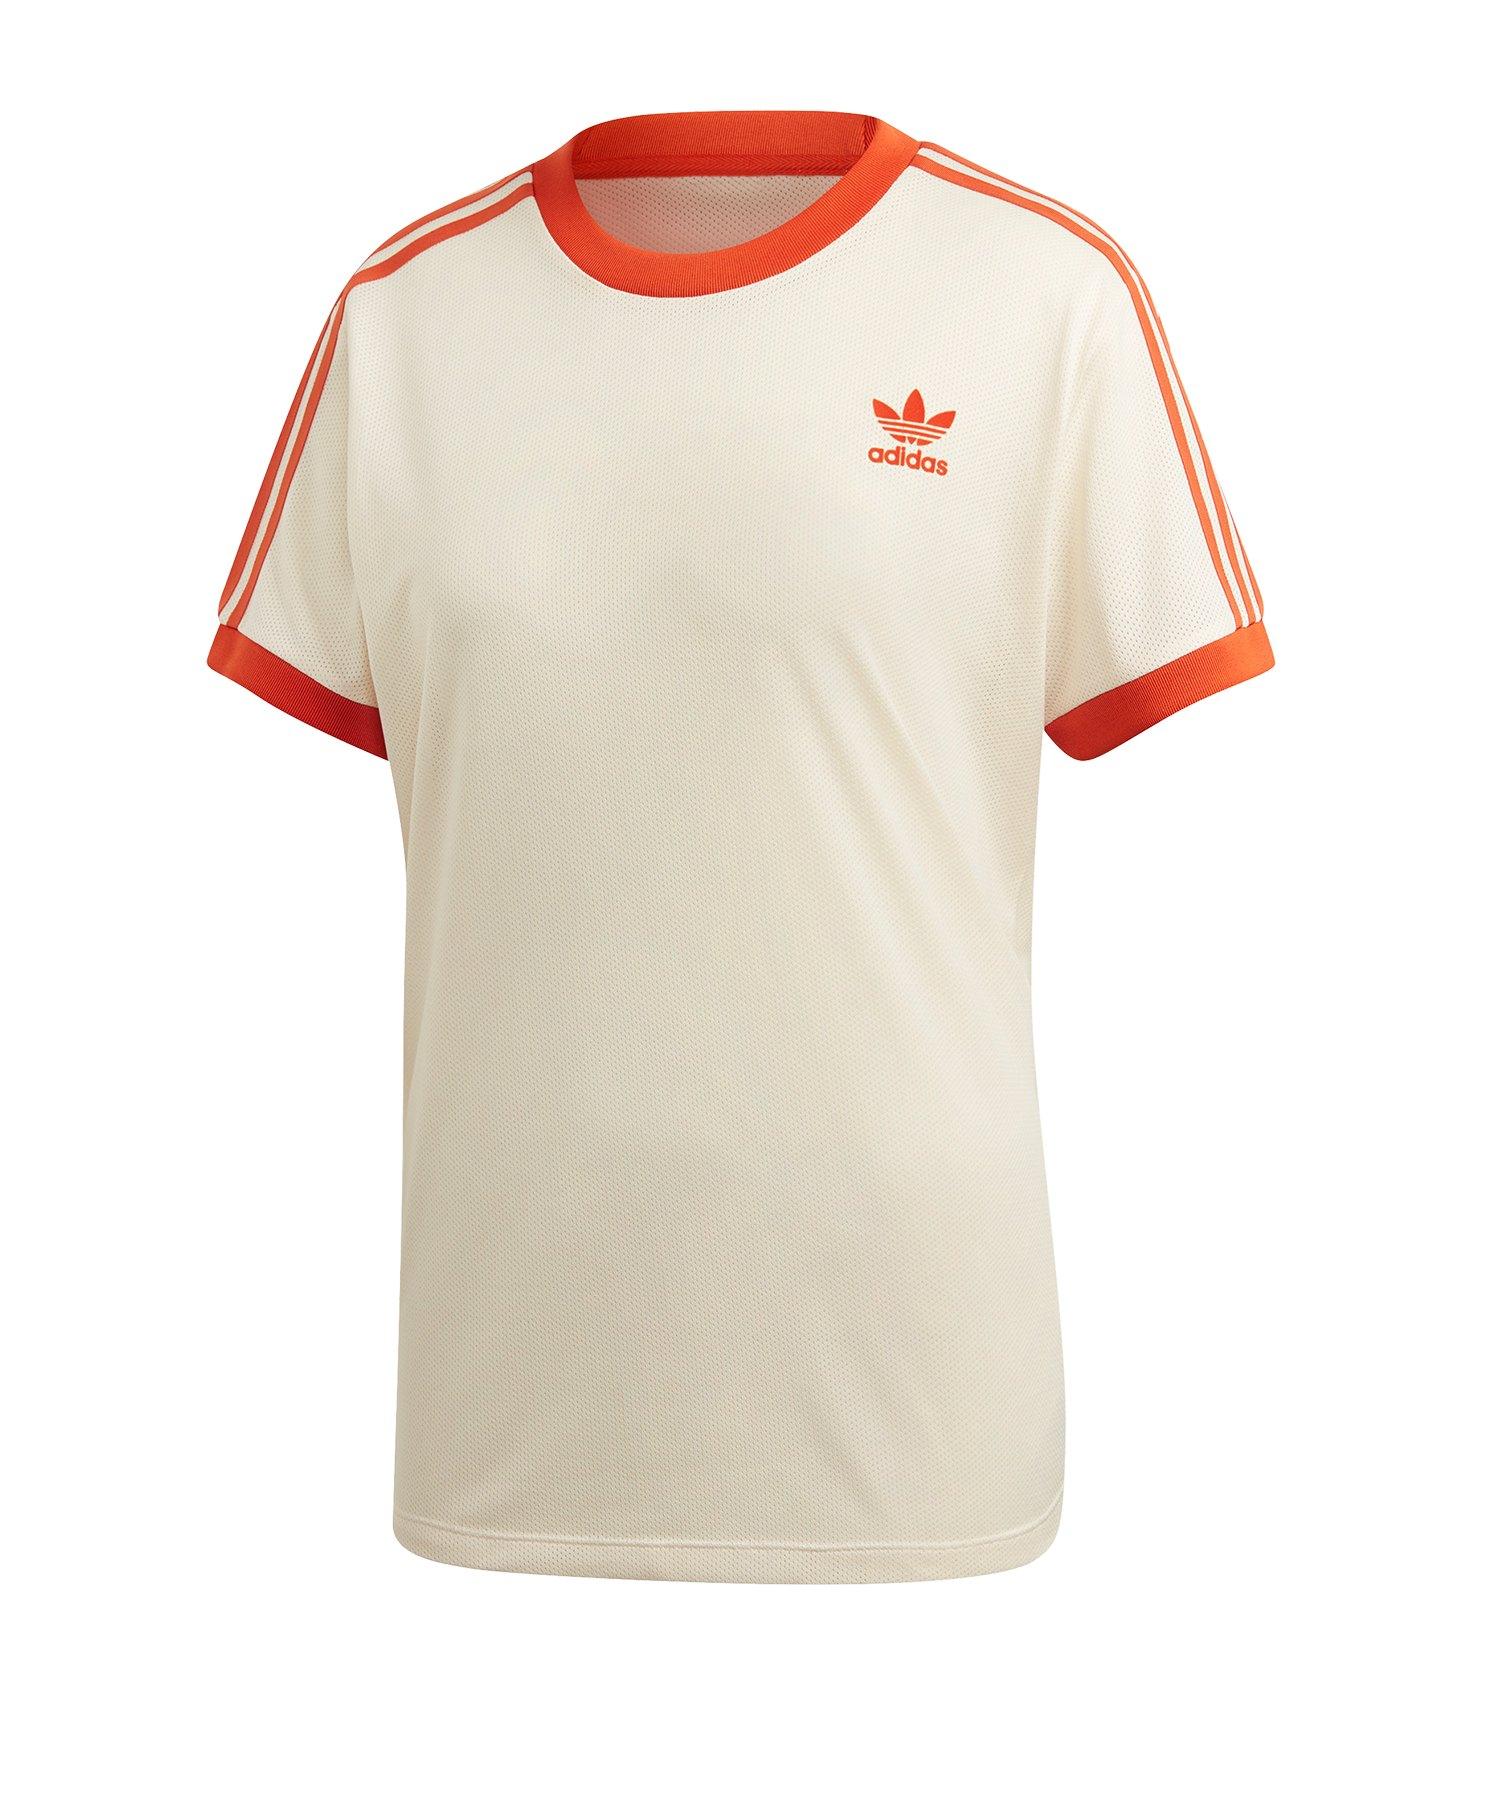 b72cb3109c244 adidas Originals 3-Stripes Tee T-Shirt Damen Weiss |Lifestyle ...